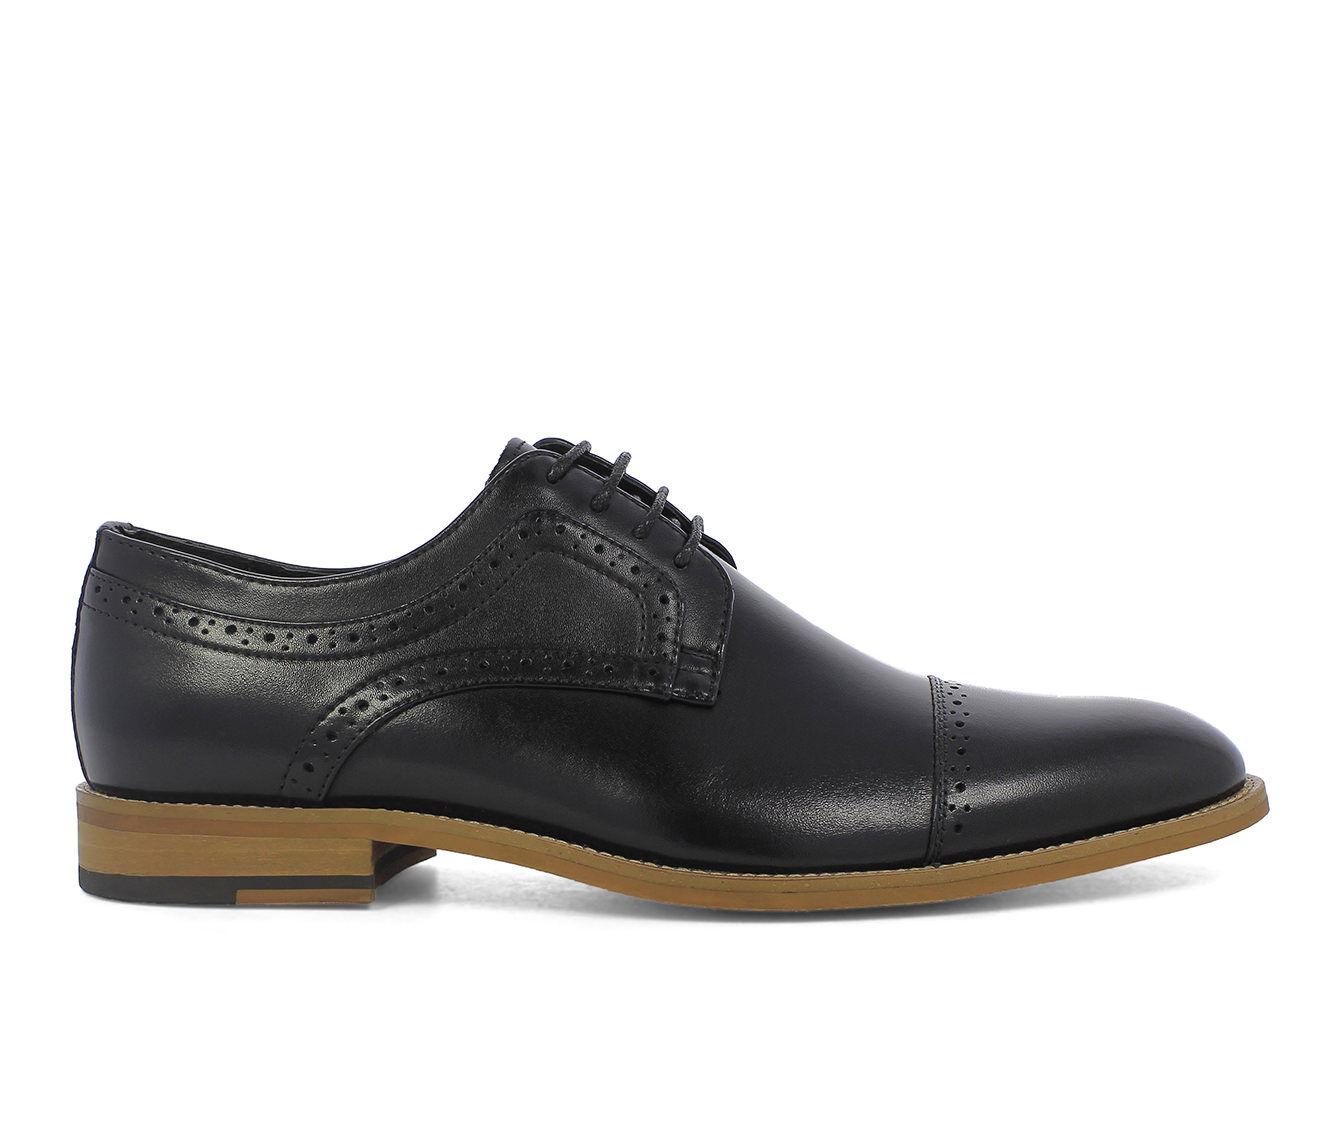 Men's Stacy Adams Dickinson Dress Shoes Black